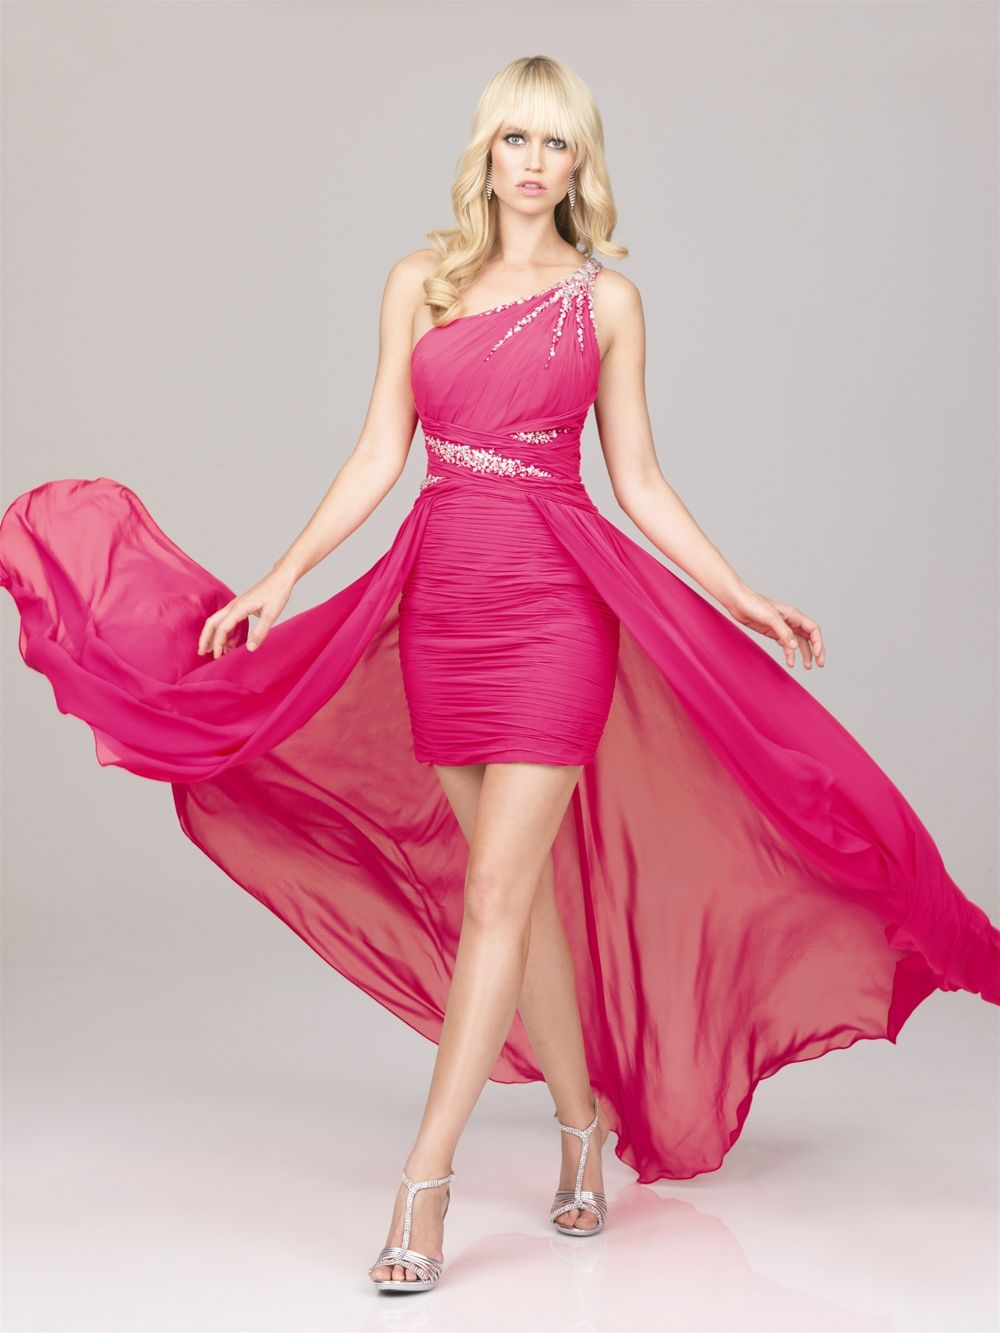 Asombroso Boda Tiendas De Ropa Lincoln Bosquejo - Ideas de Vestido ...